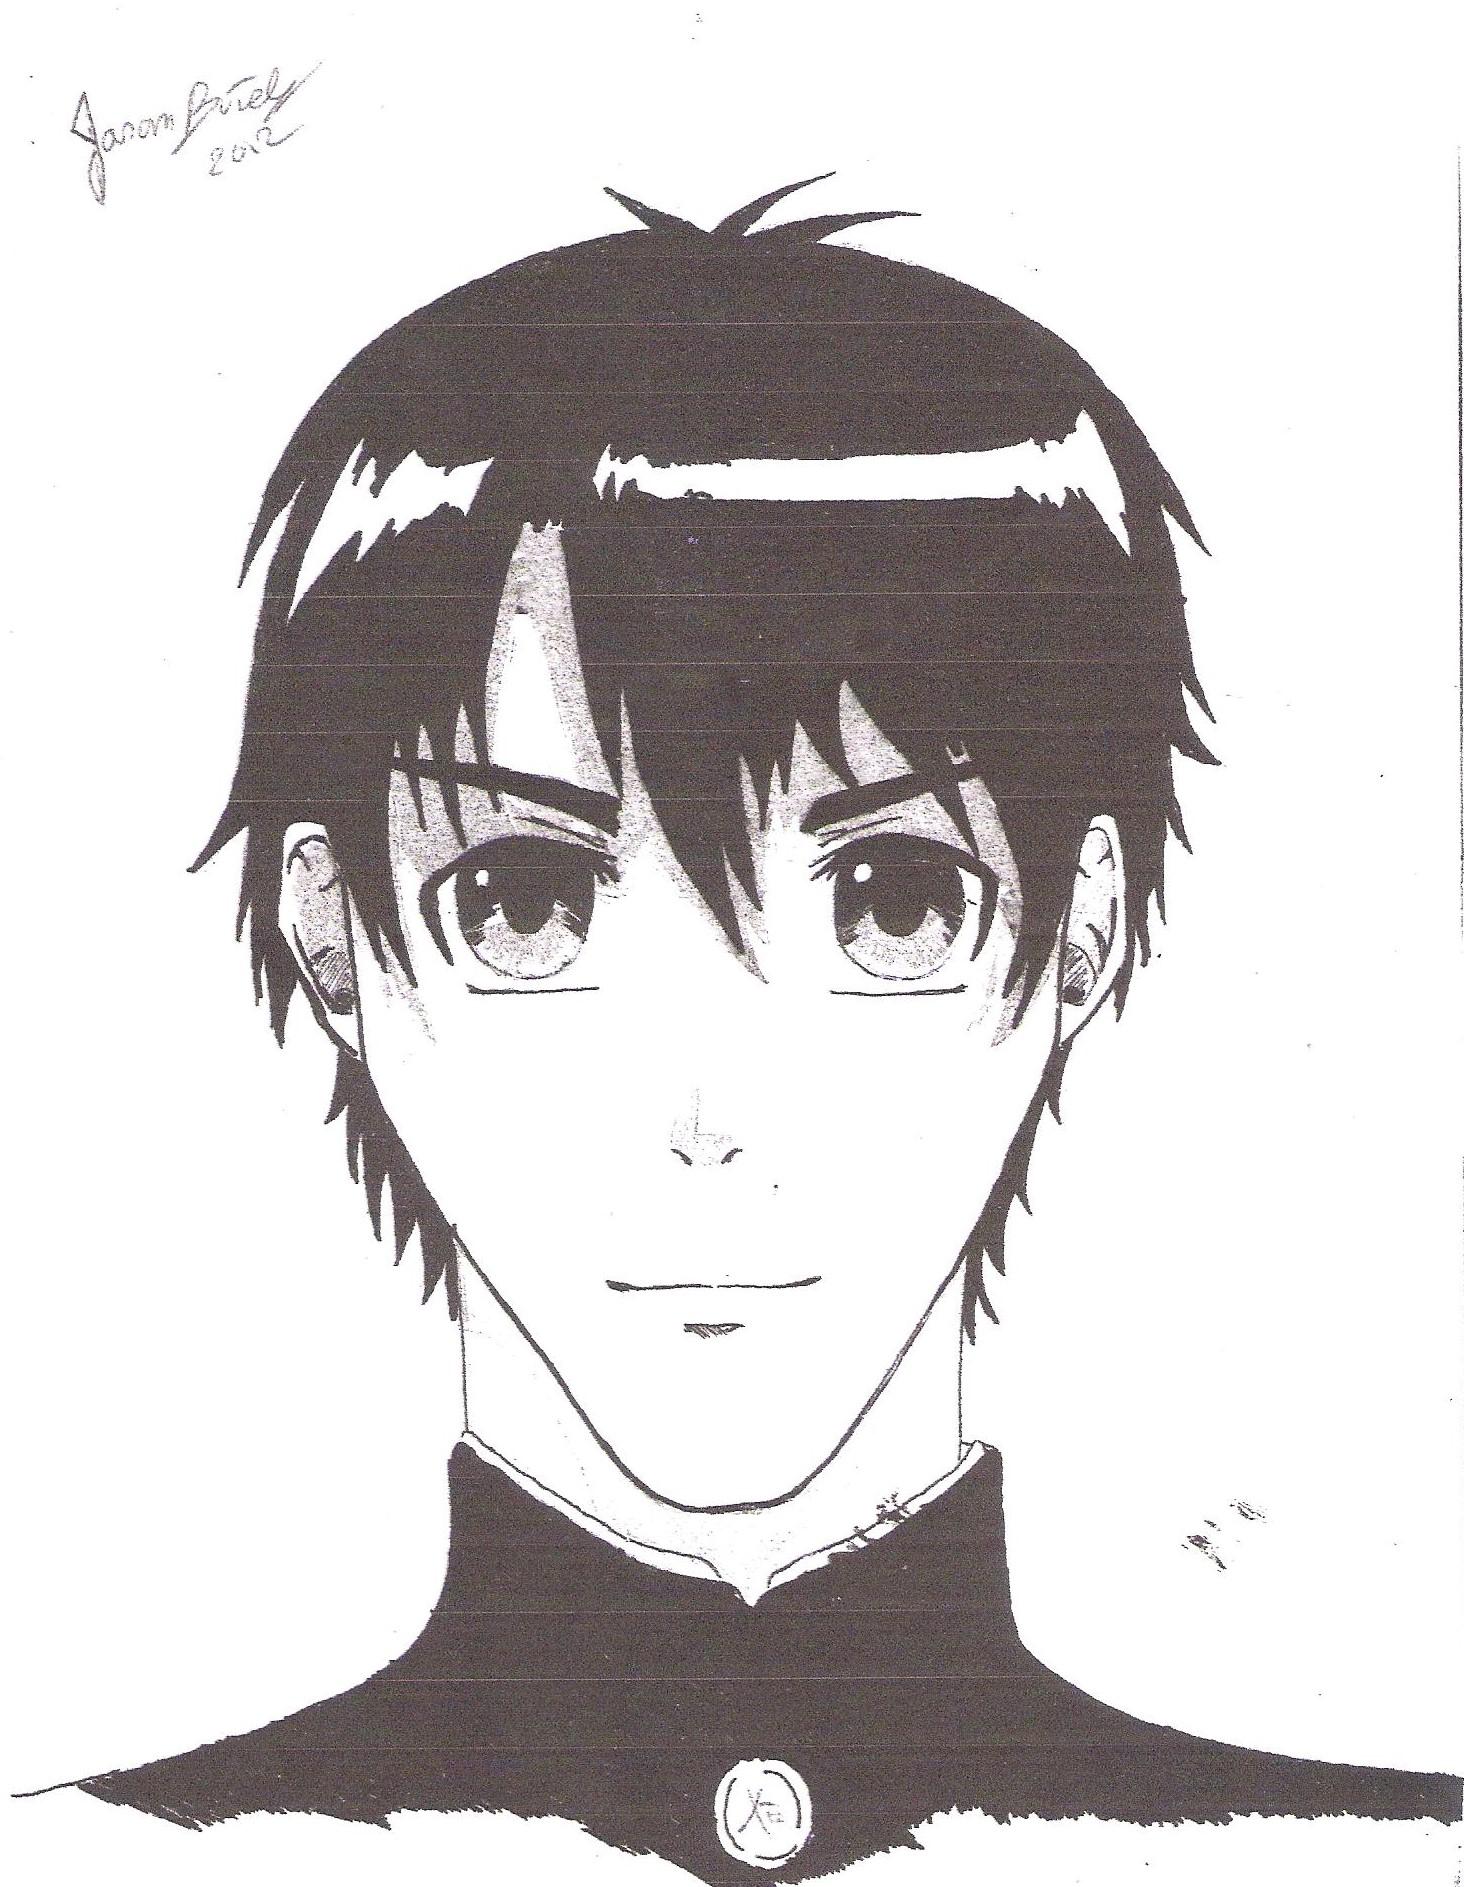 dessin manga jason butel - Dessin Manga